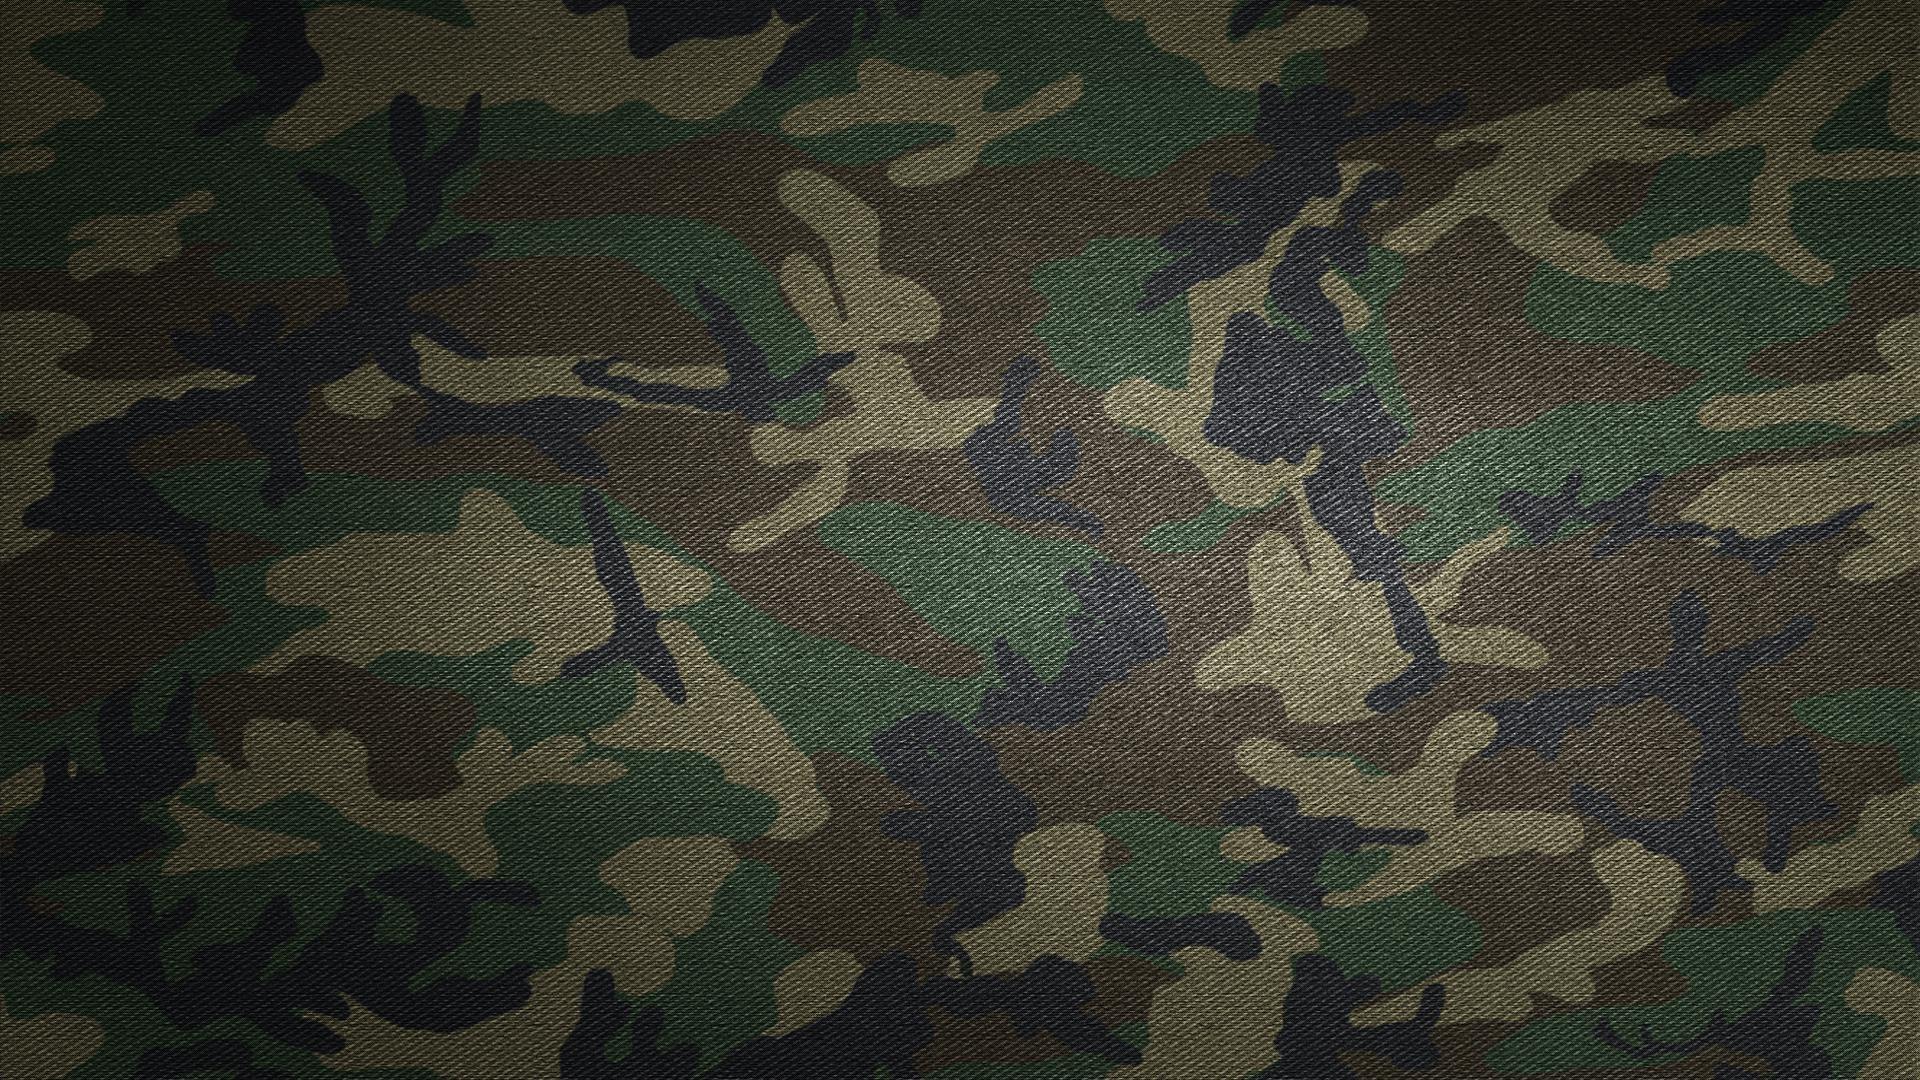 army camo iphone wallpaper …